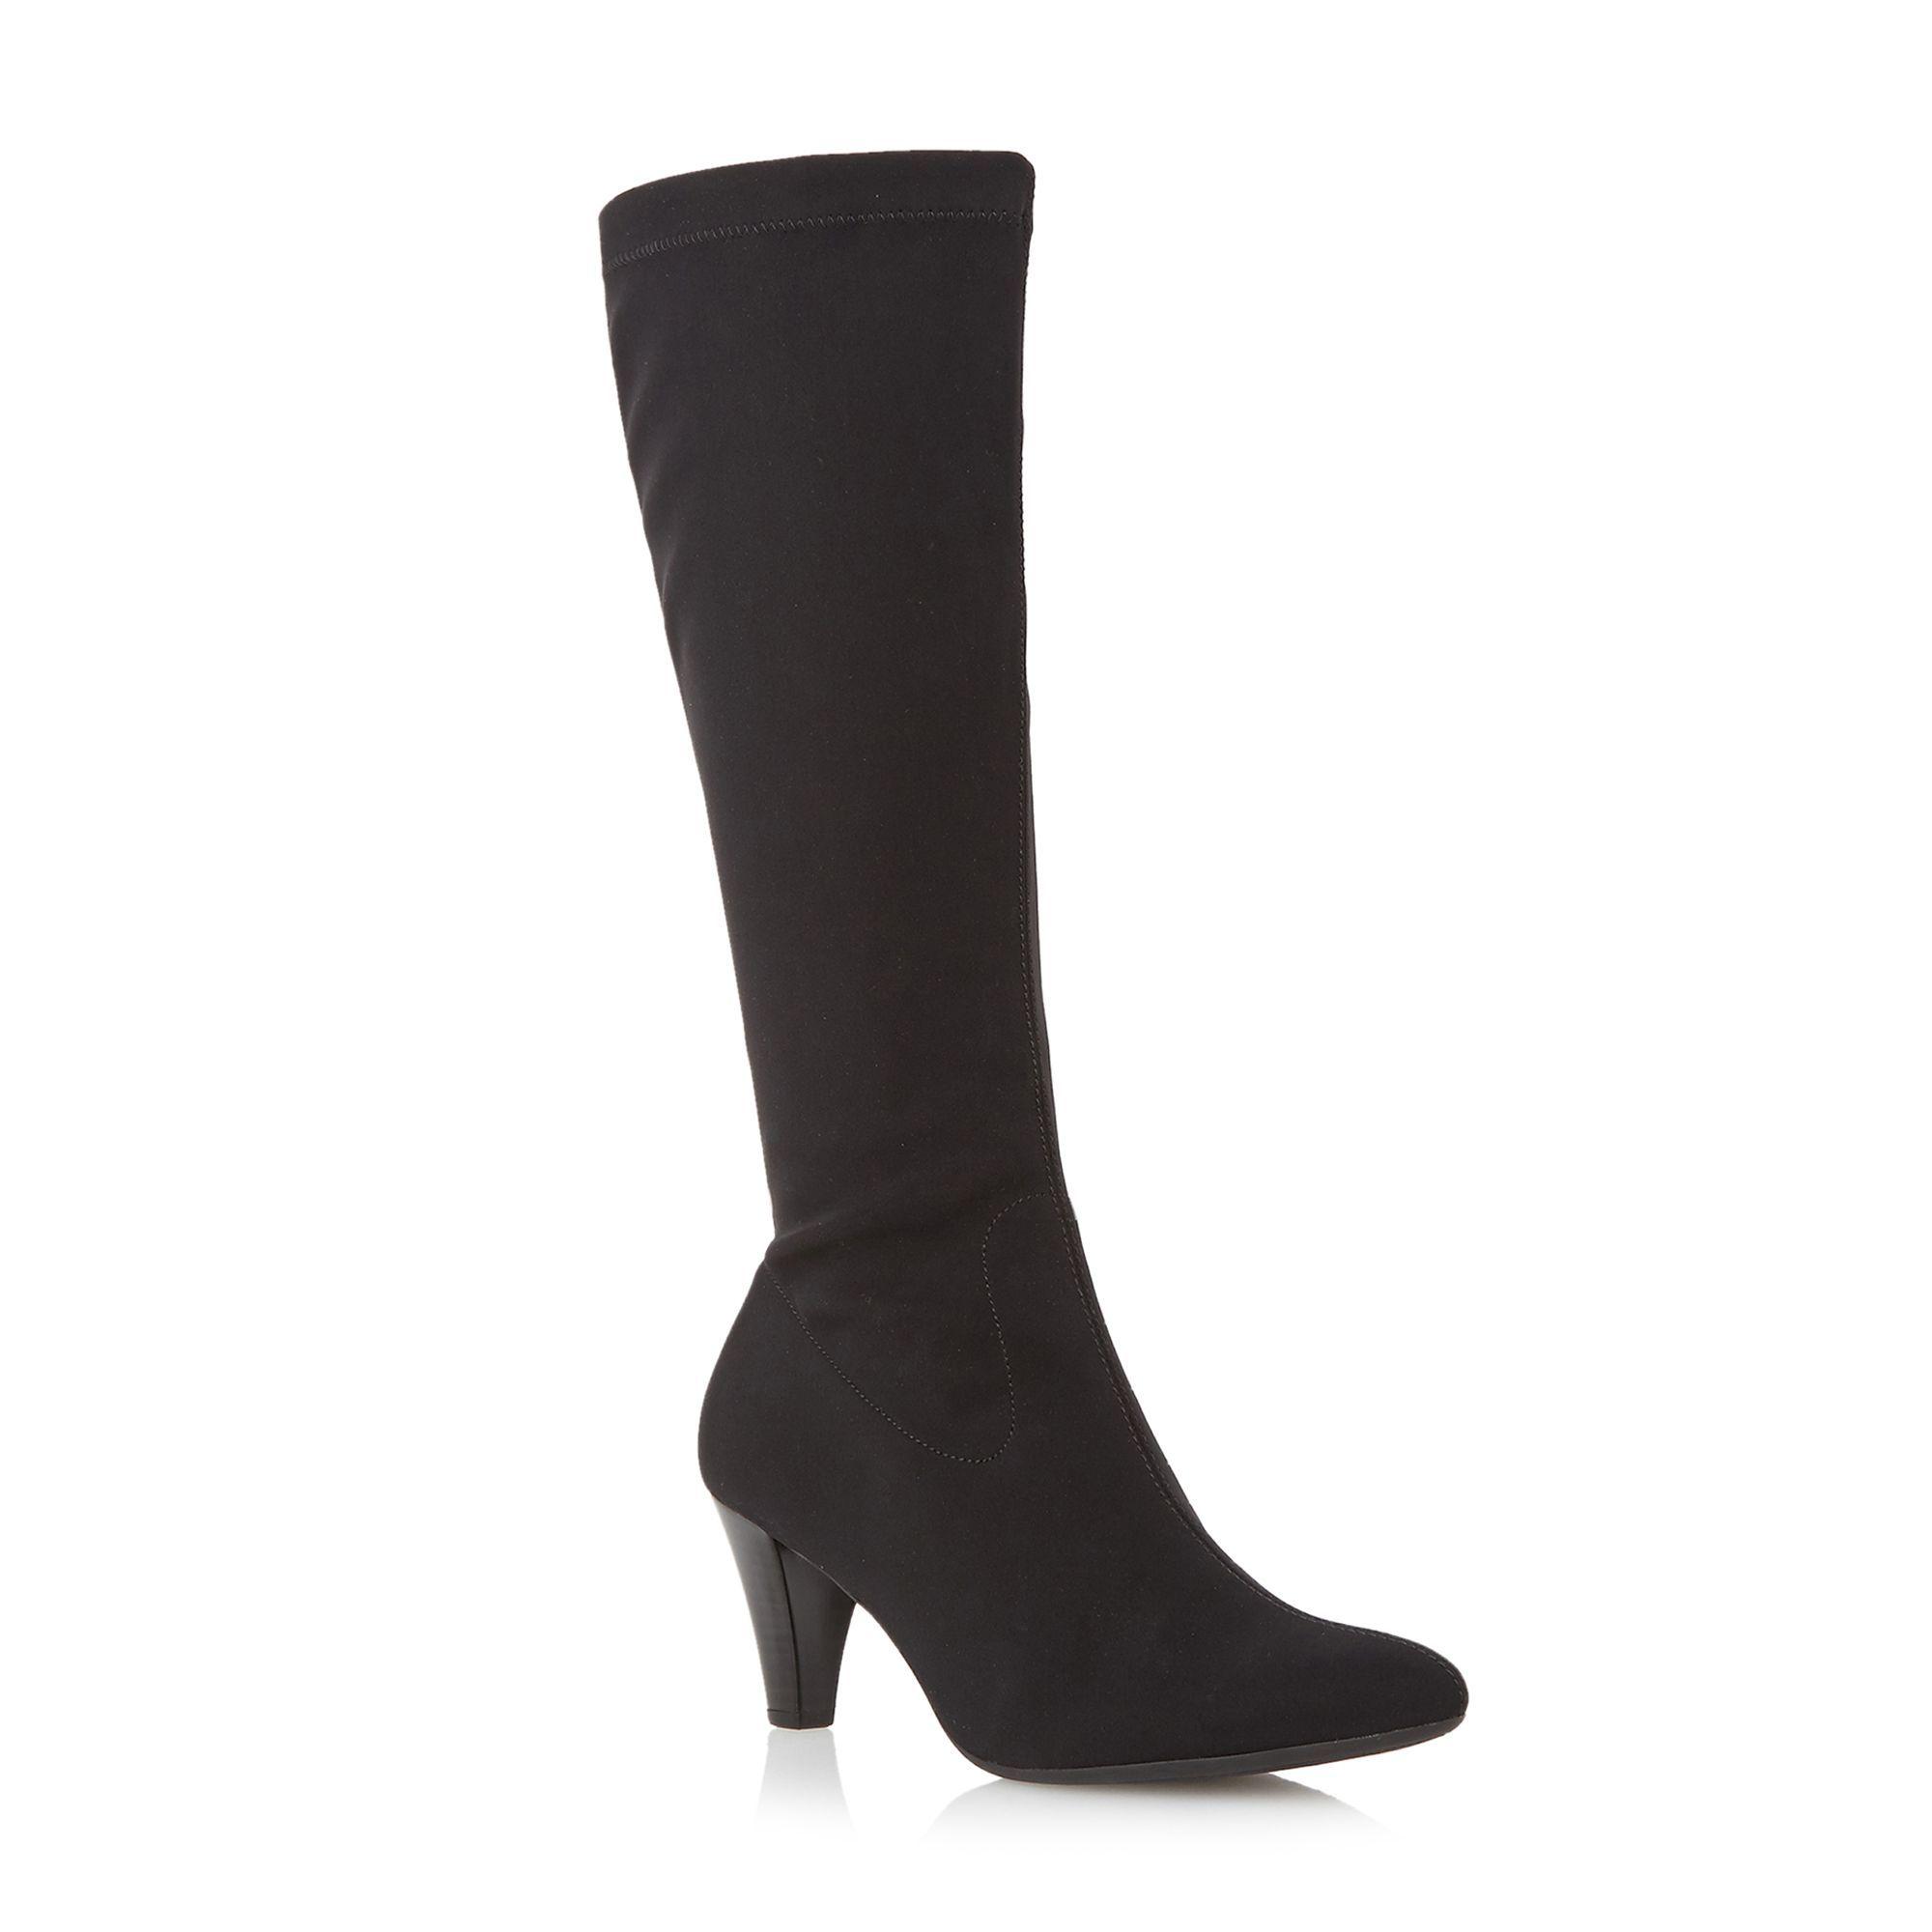 Gabor Koola stretch knee high heeled boots, Black